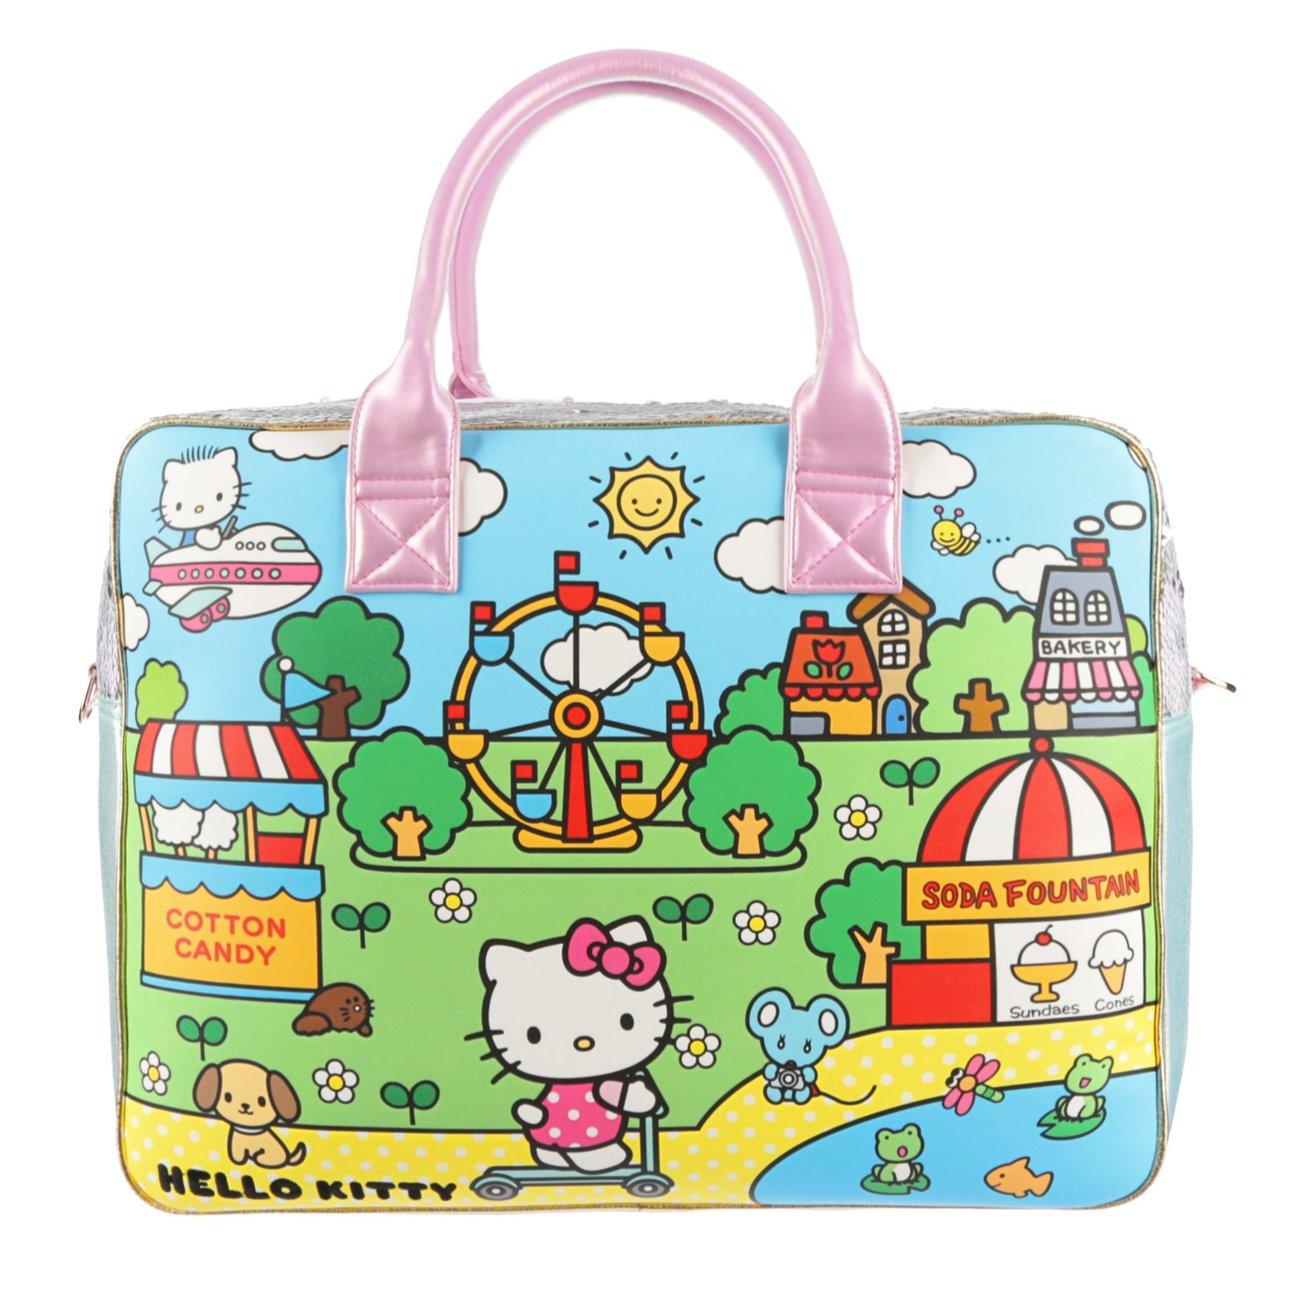 Friendship Travel Bag